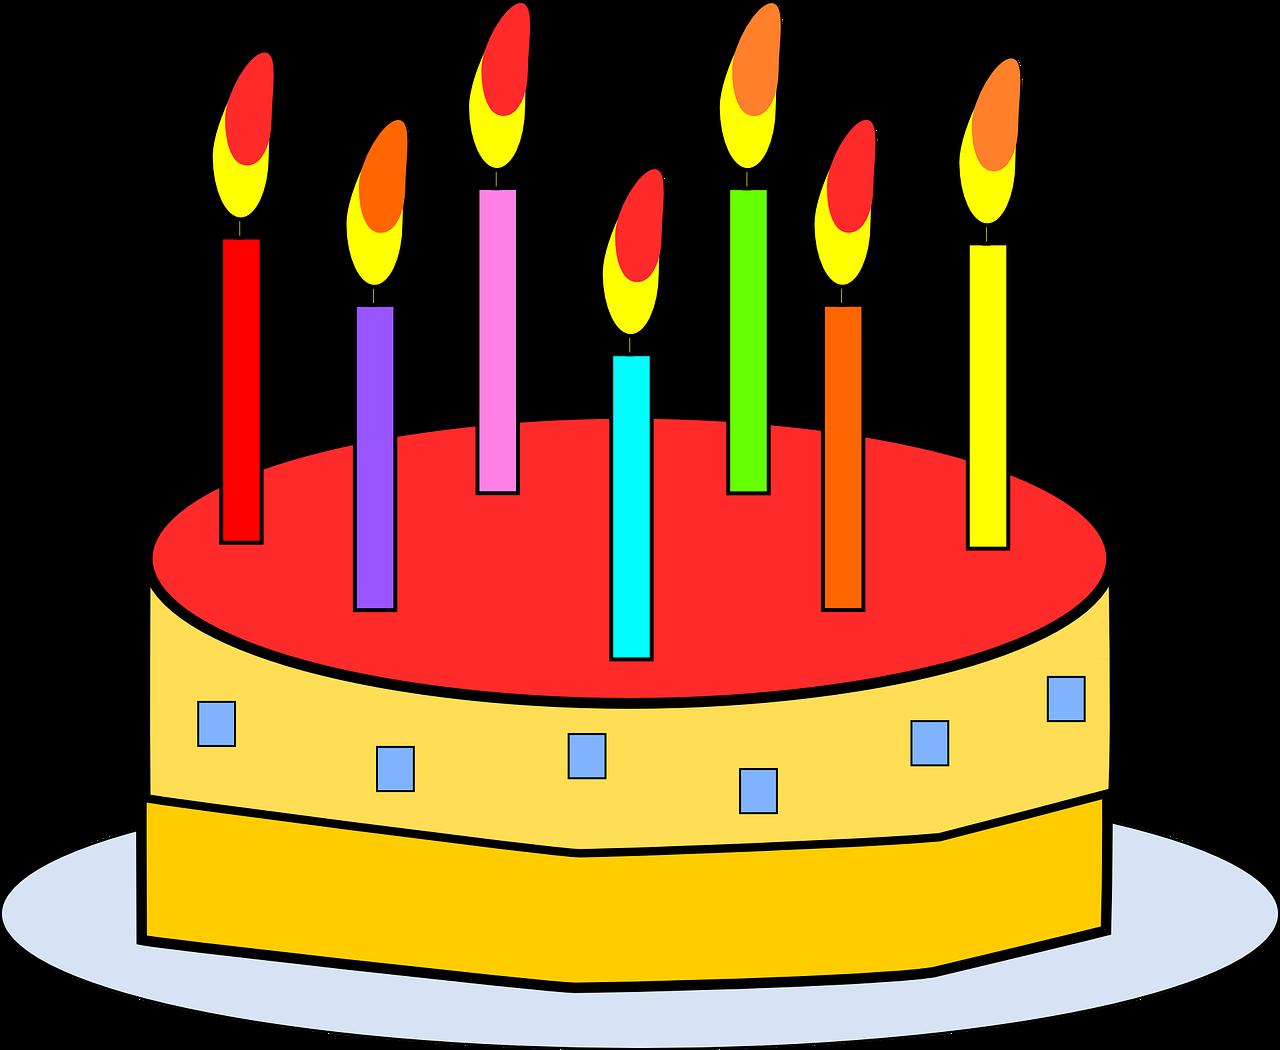 Strange Birthday Cake Food Free Vector Graphic On Pixabay Personalised Birthday Cards Beptaeletsinfo